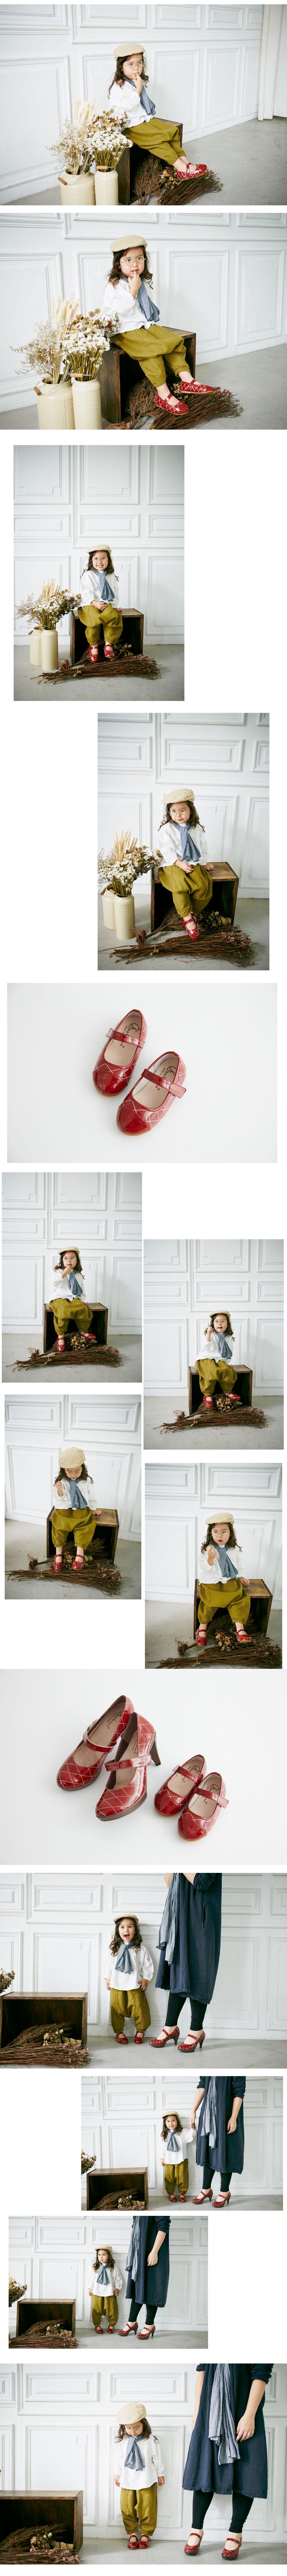 http://shop.r10s.com/5e7ca0c0-ec8c-11e4-ac44-005056b756e3/2015-12-kid/C7045-4.jpg